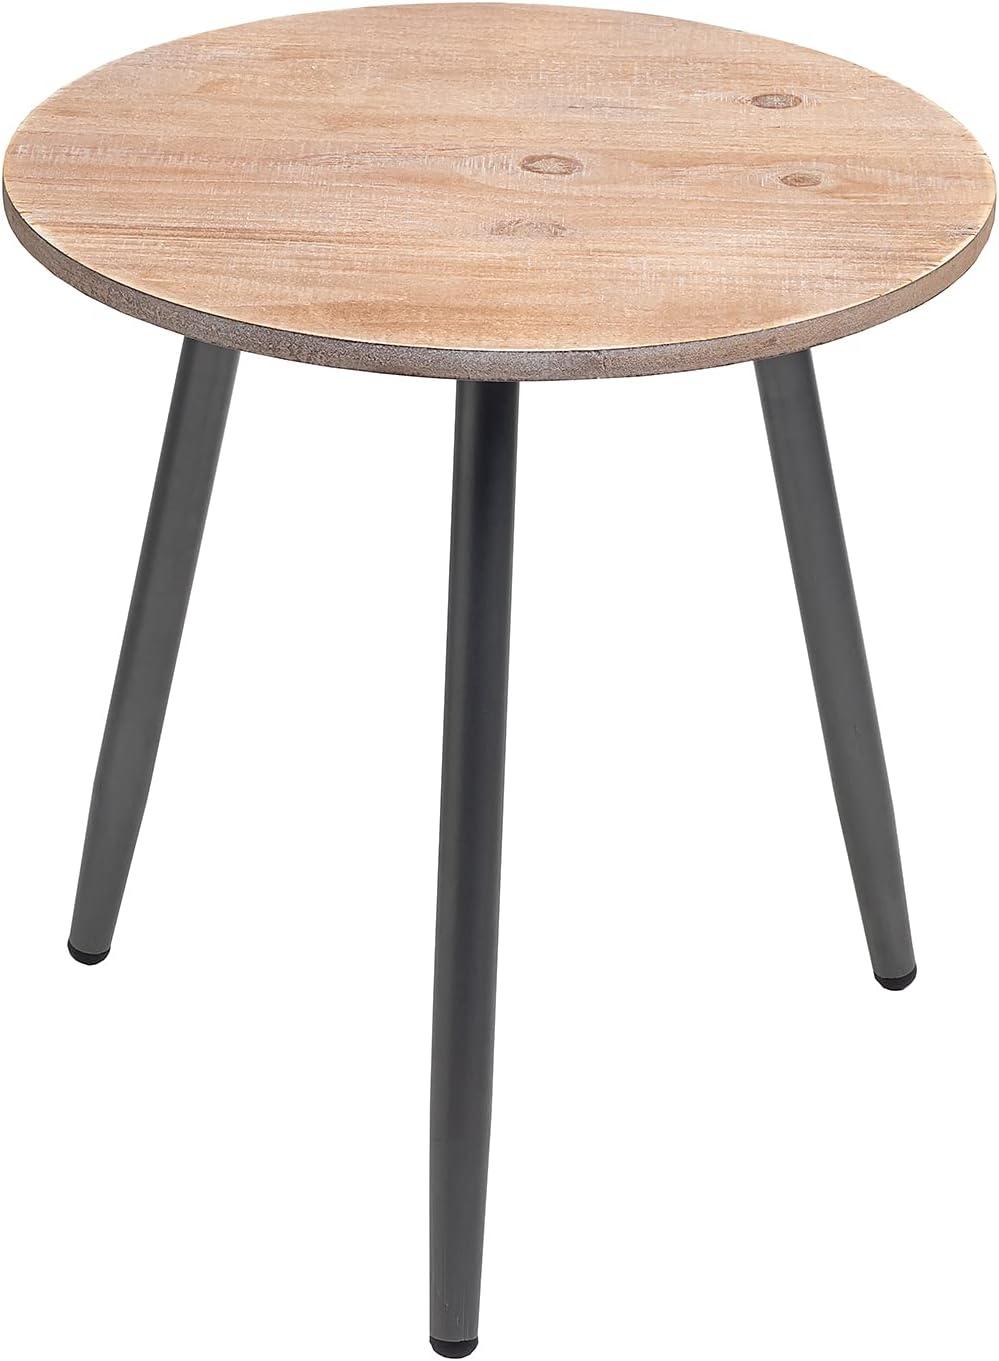 XKXKKE Side Table Inexpensive Round White Modern Coffee Tea Decor Home Tulsa Mall End